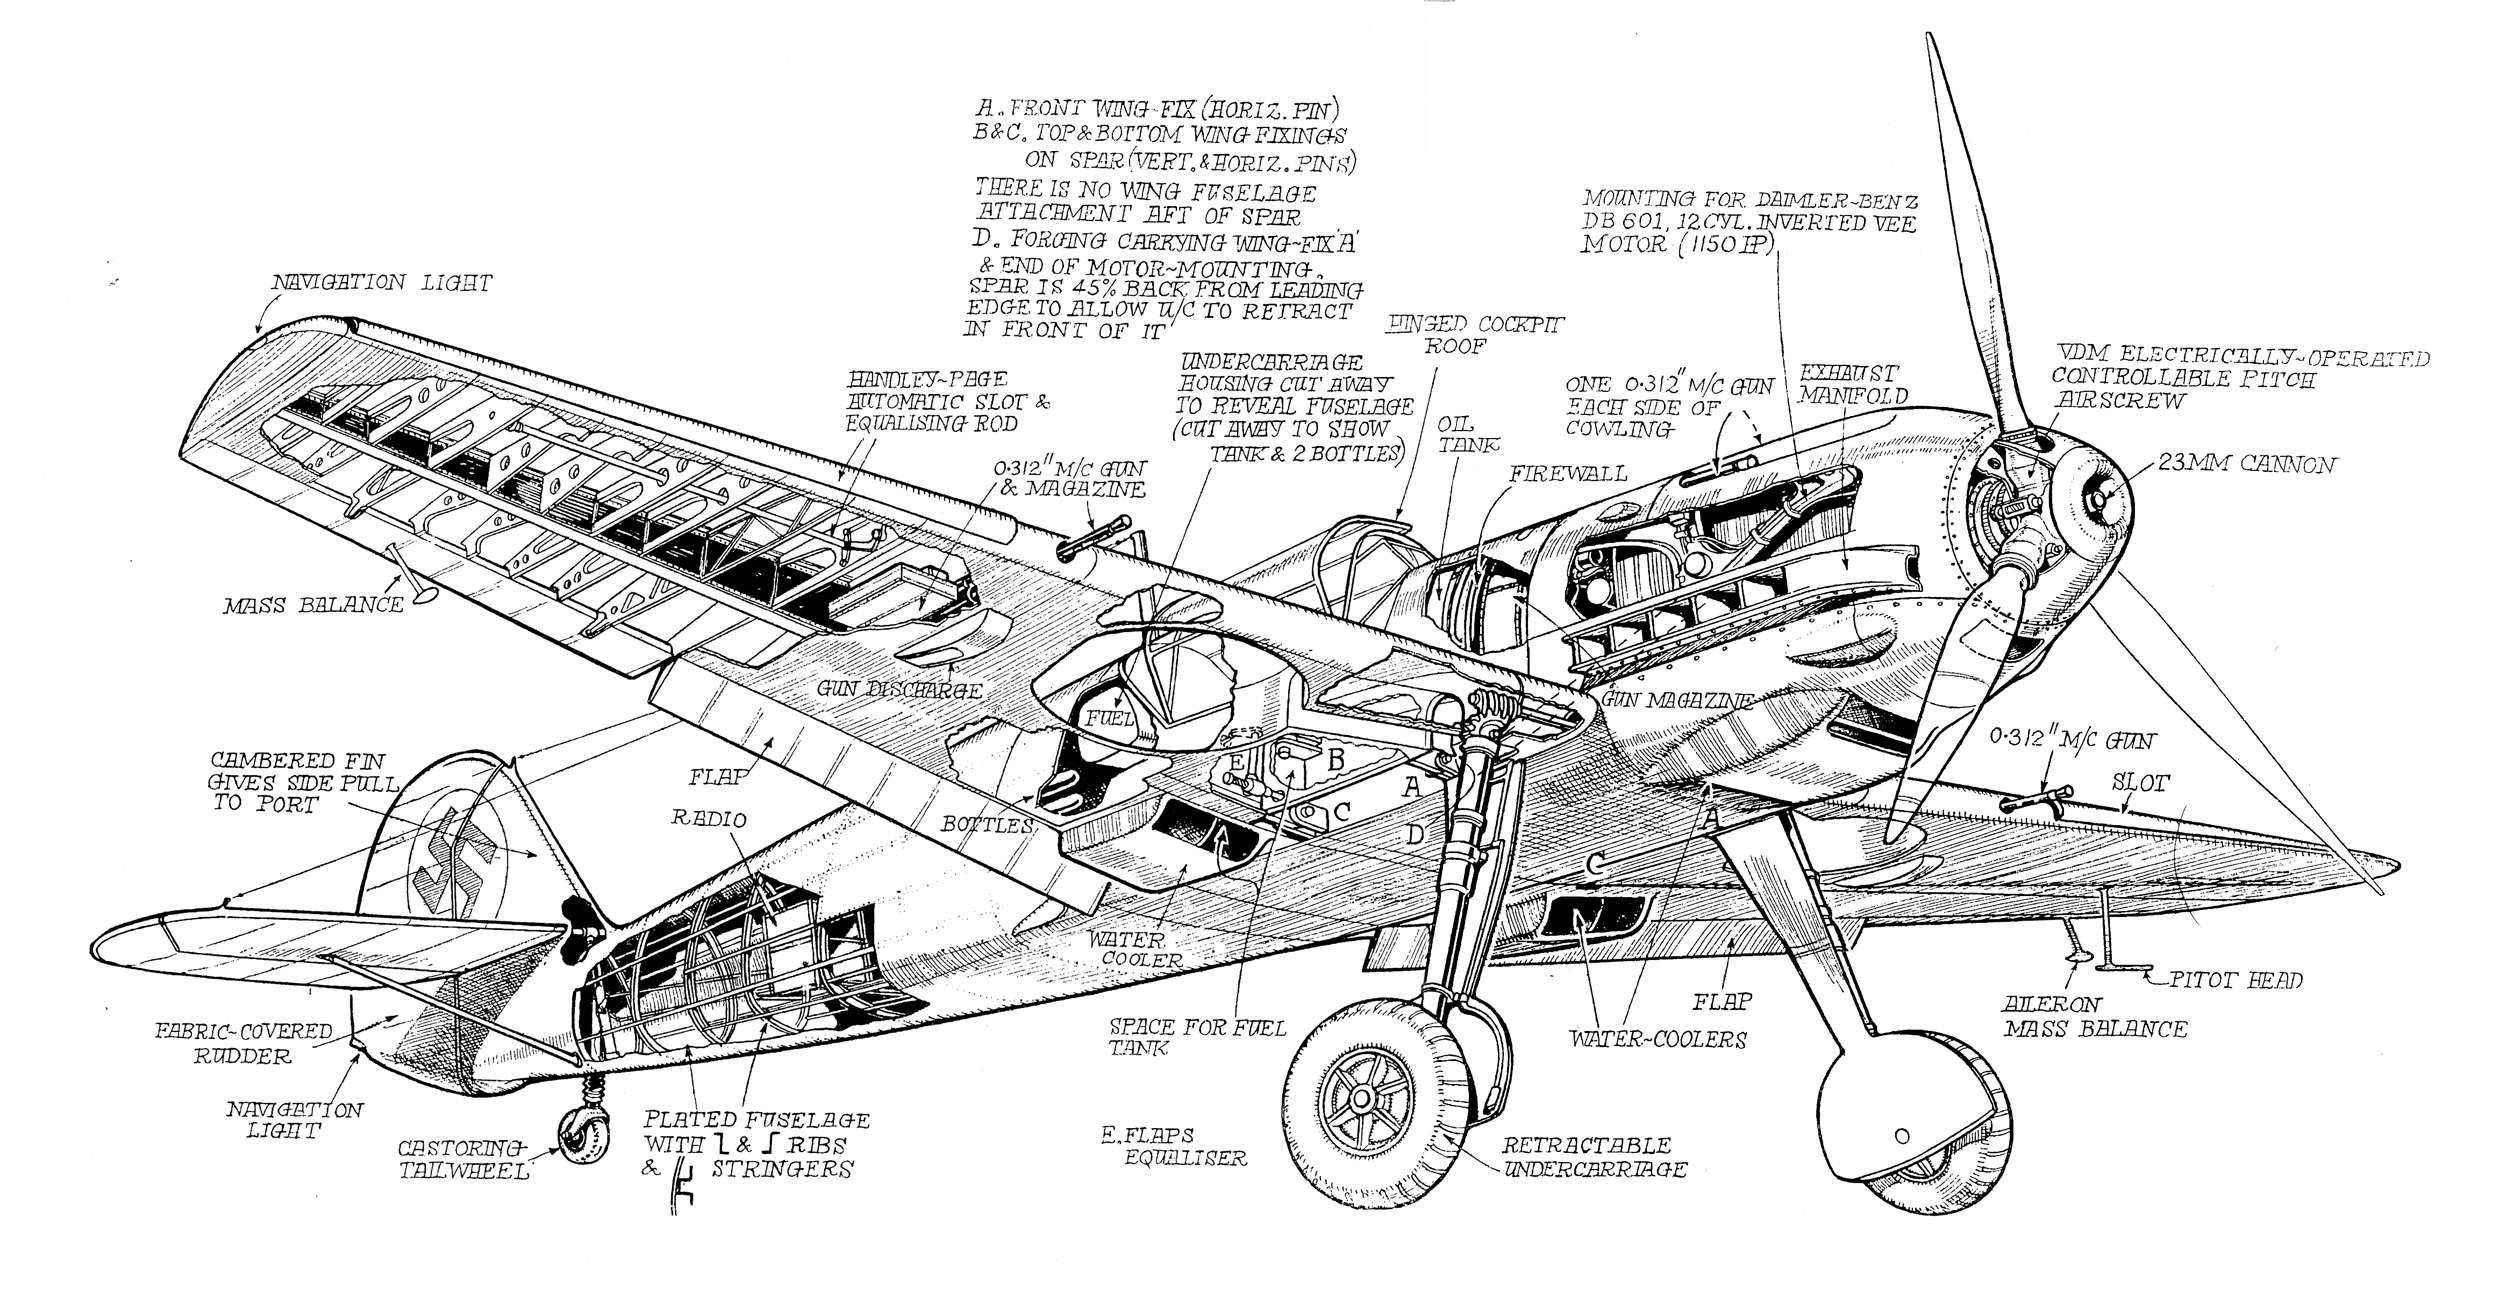 Diagrams Of Bf 109 Another Blog About Wiring Diagram Cf Moto Messerschmitt 109e Pleasantly Wrong The Dreamy Dodo Rh Elpoderdelasgalaxias Wordpress Com